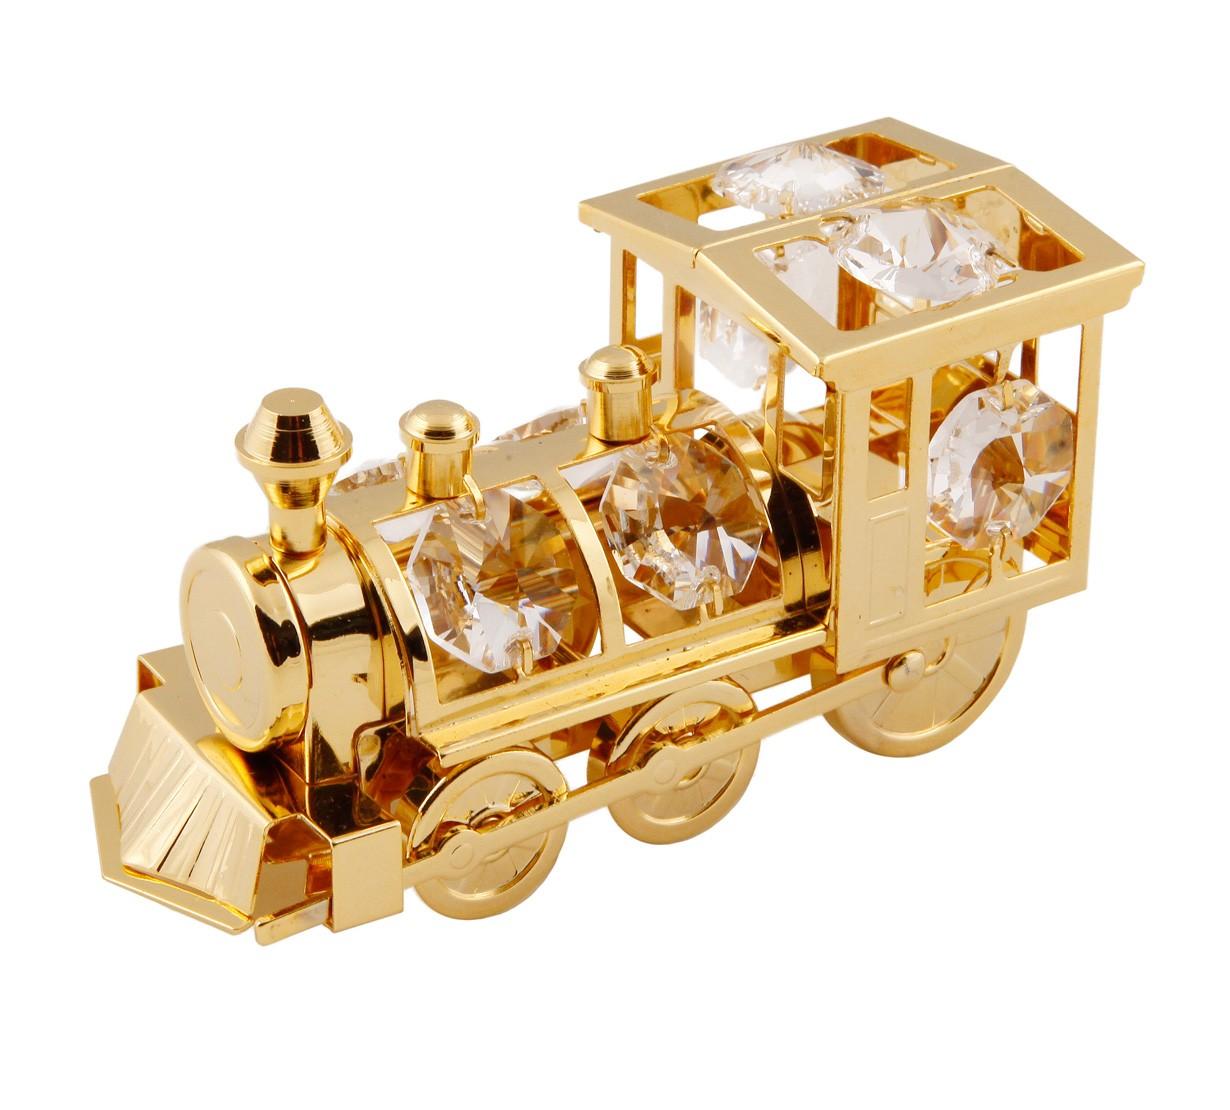 Locomotiva cu Cristale Swarovski - placata cu Aur 24k